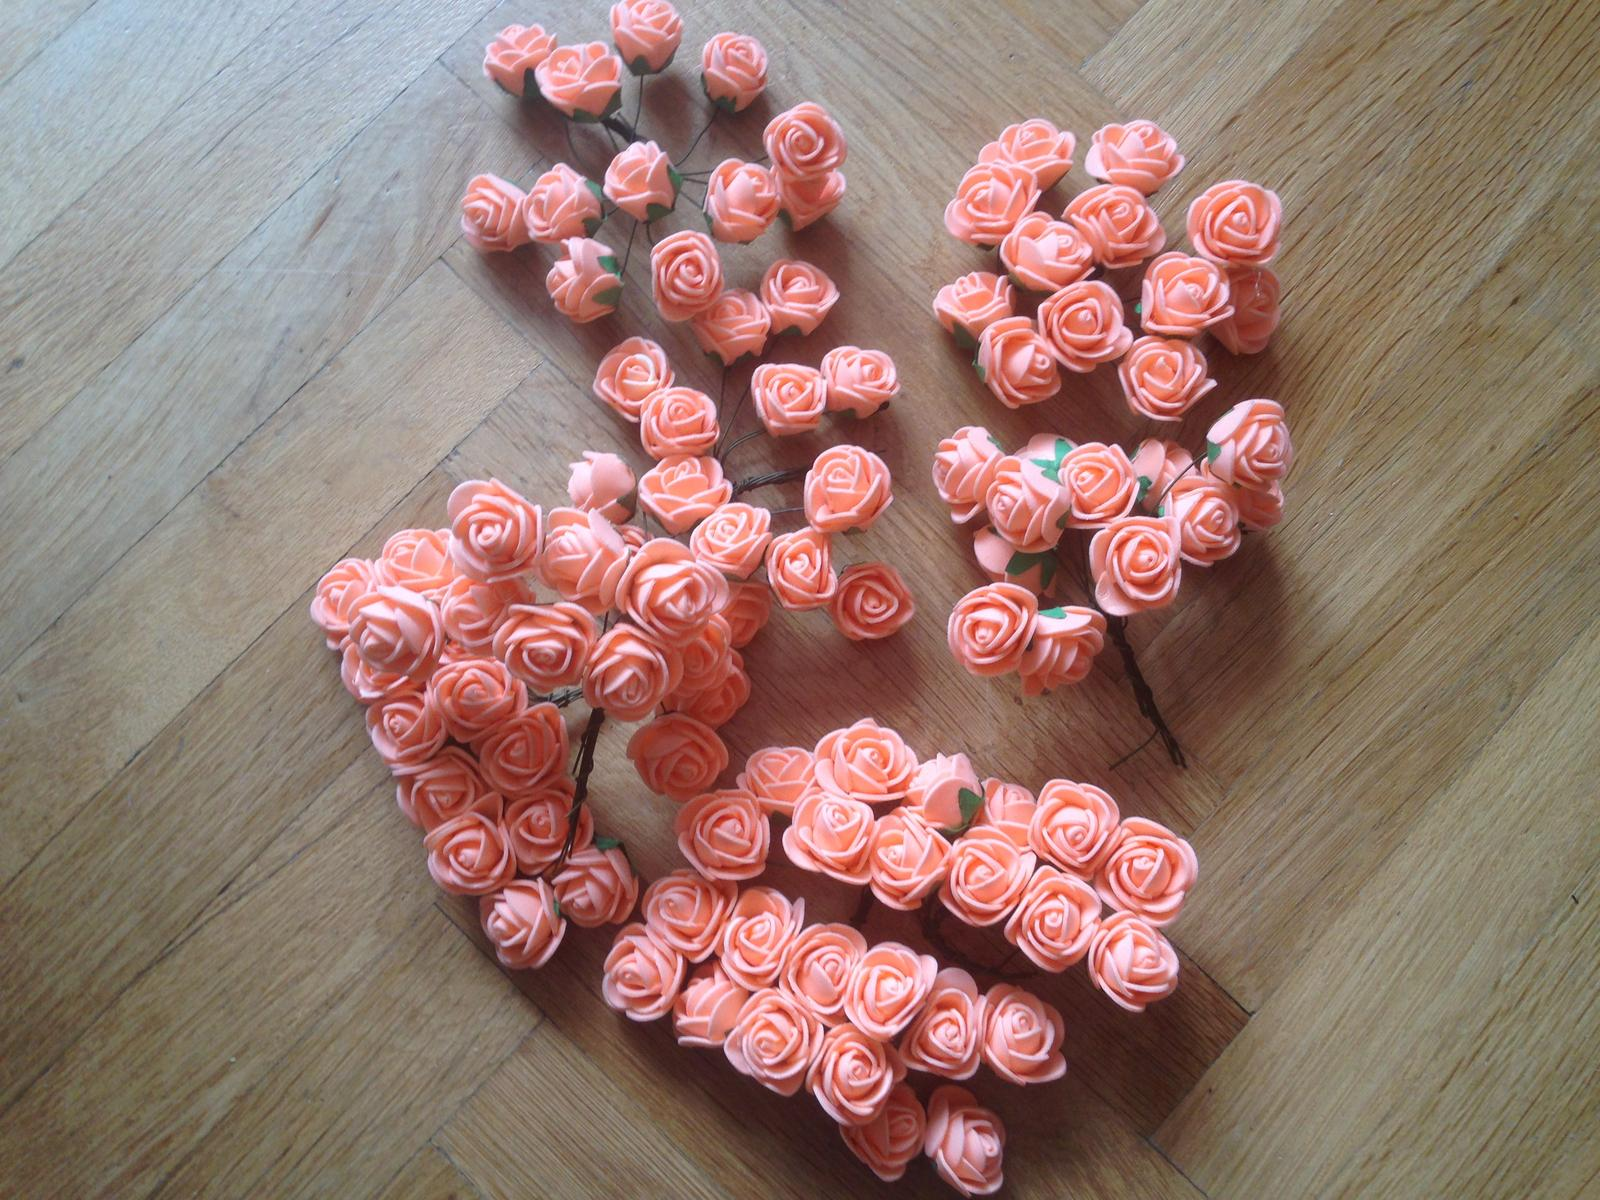 Oranžové pěnové kytičky na drátku - Obrázek č. 1